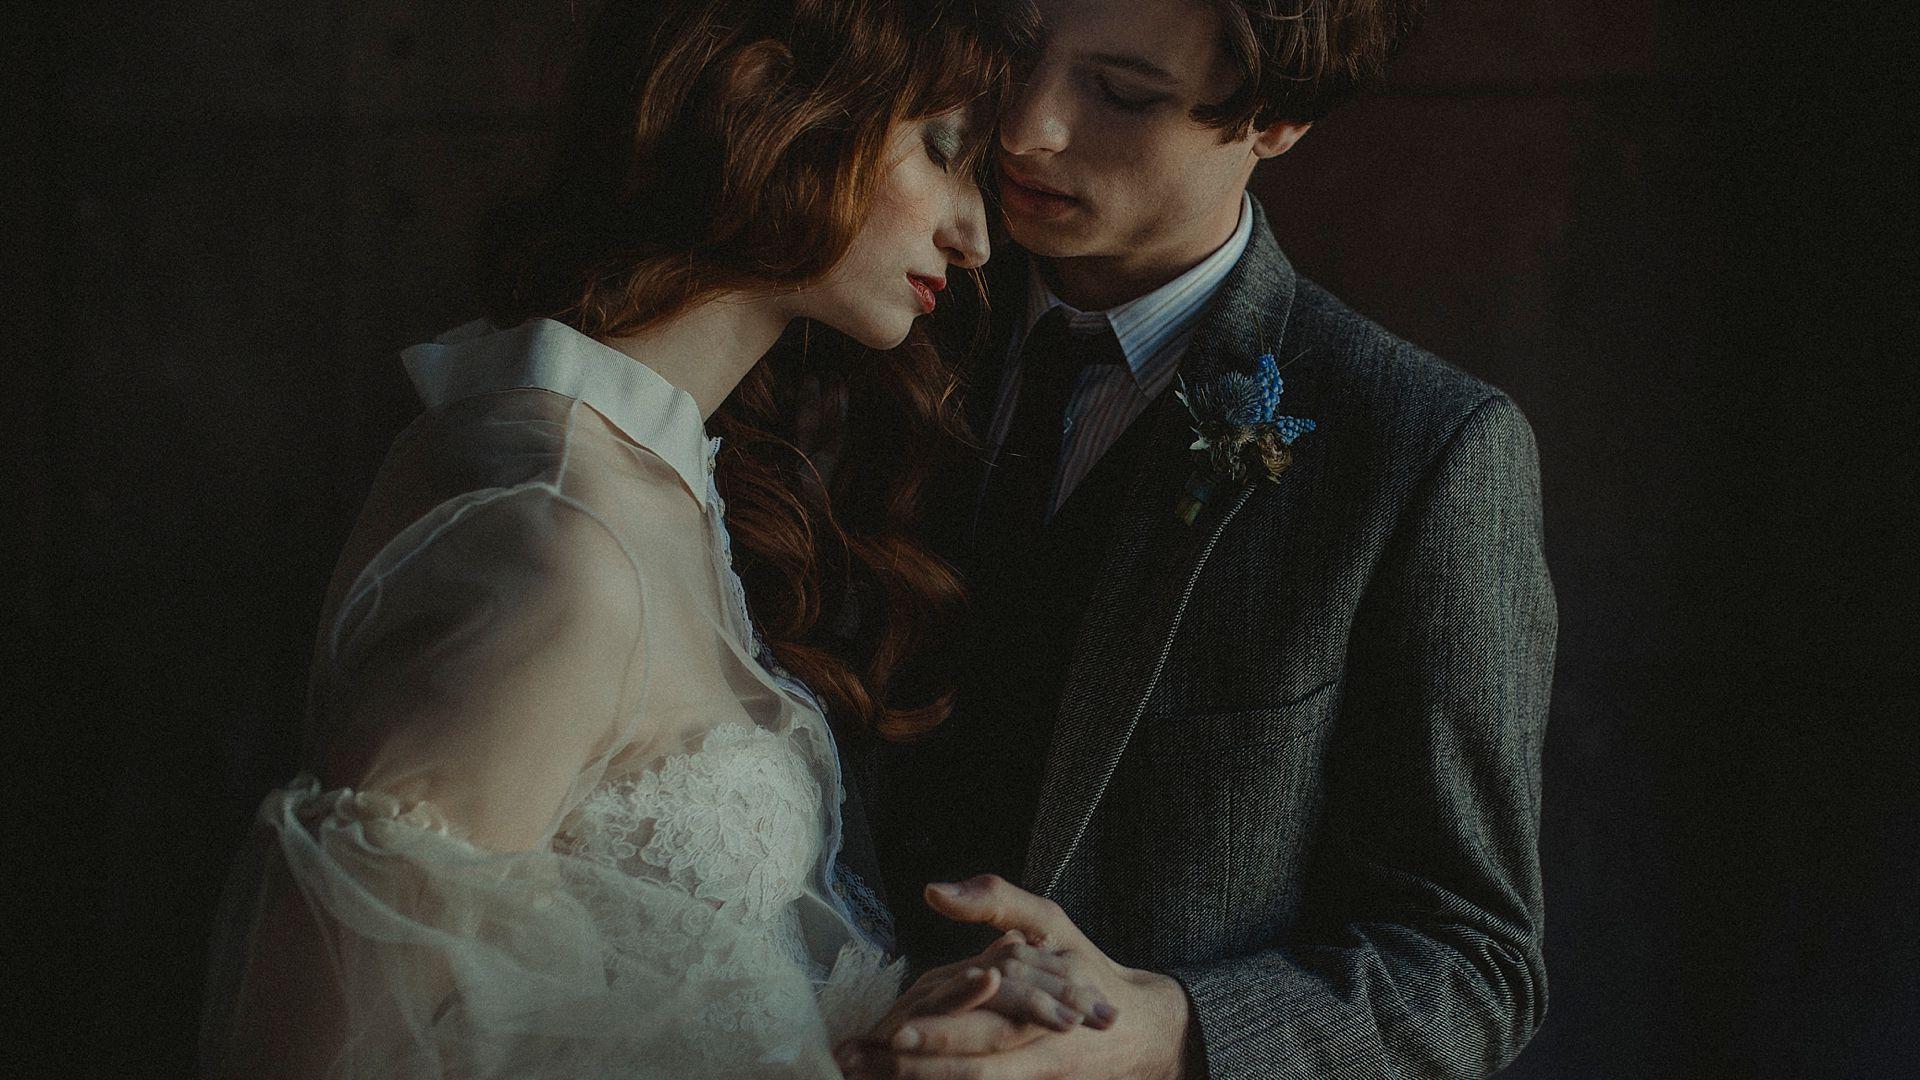 Decadent Wedding Inspiration- Moody Wedding Inspiration- Sudio Fotografico Bacci- Unconventional Wedding- editorial wedding